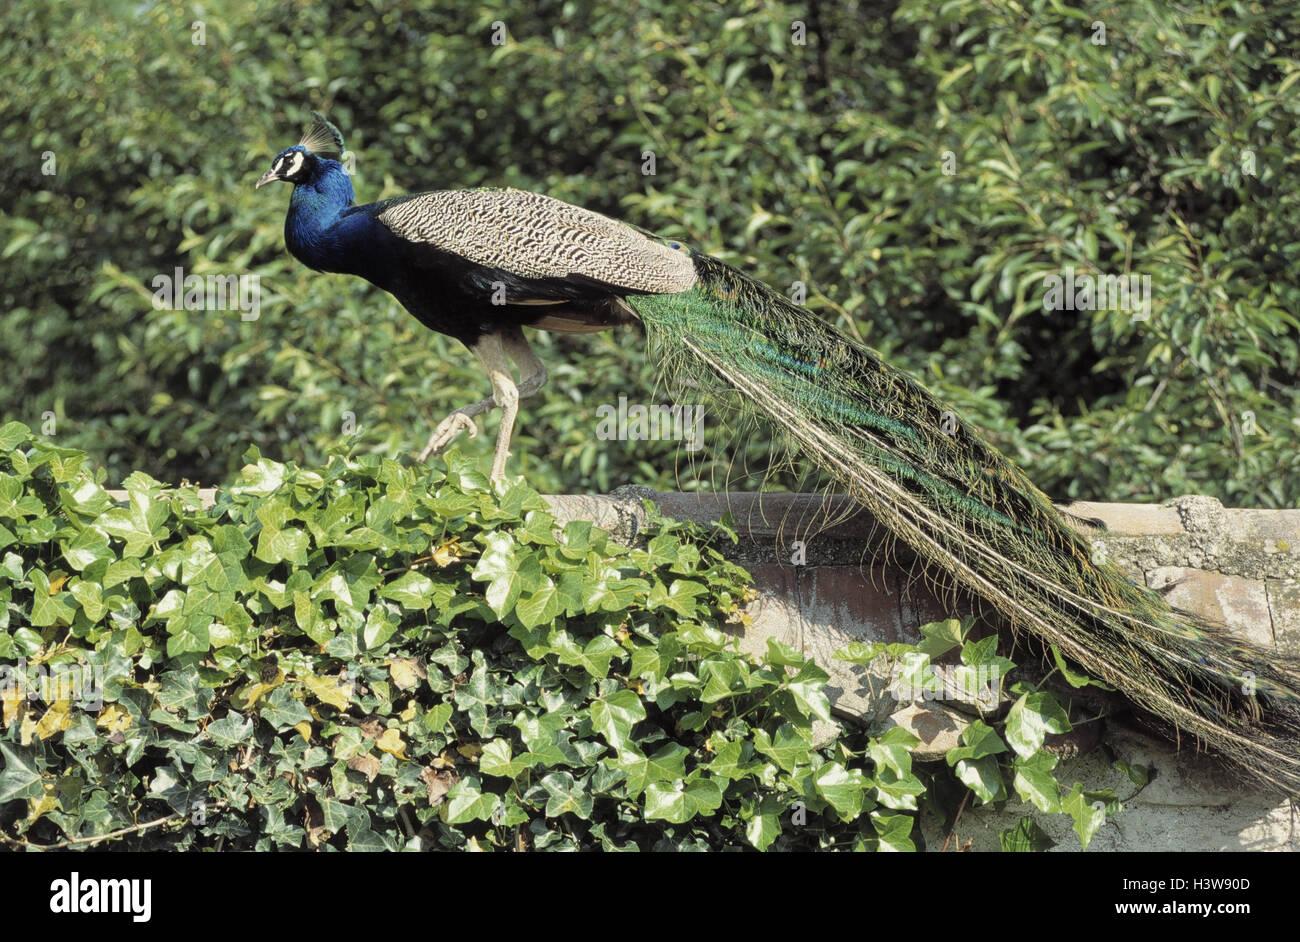 Farm, blue peacock, Pavo cristatus defensive wall, little man, birds, bird, gallinaceous birds, Galliformes, Phasianidae, - Stock Image